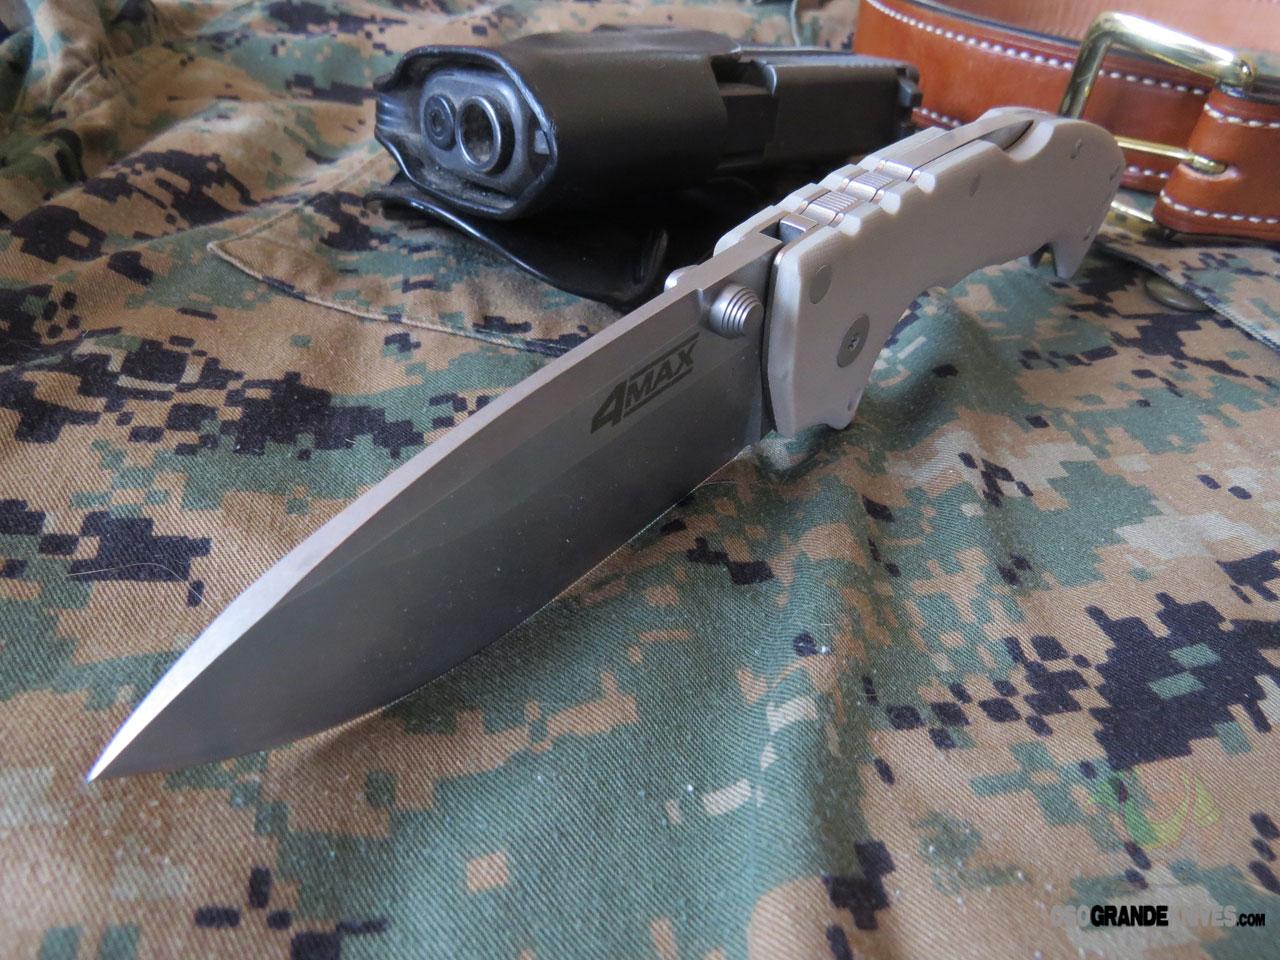 Cold Steel 4 Max Folding Knife 4 Inch Cpm 20cv Satin